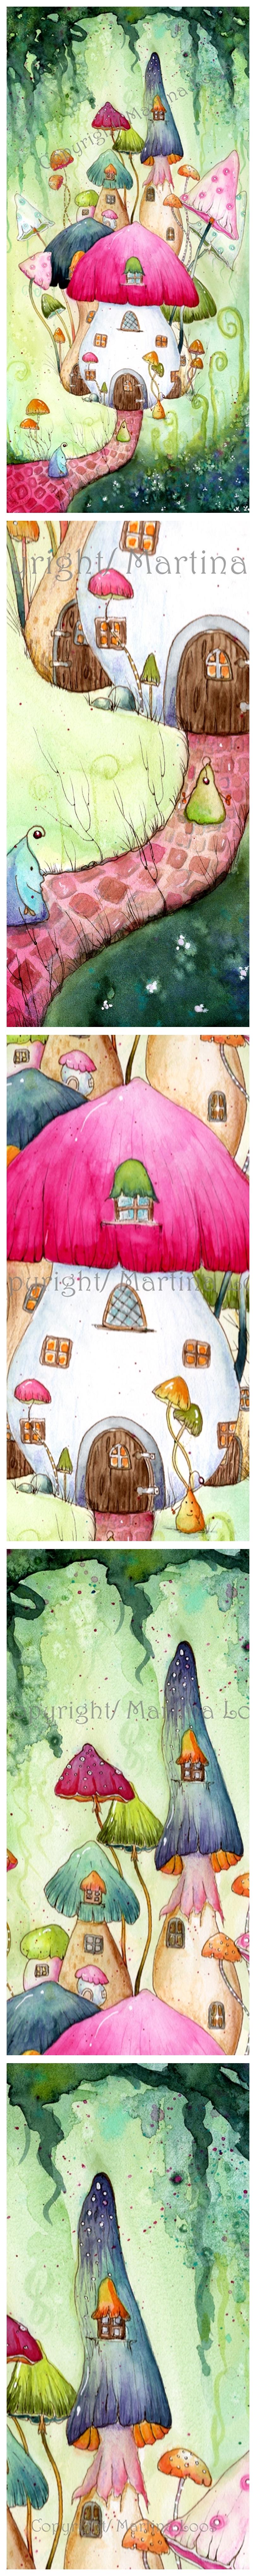 kartoffelknolli Dorf klein mit sigi-tile by dragonflywatercolors